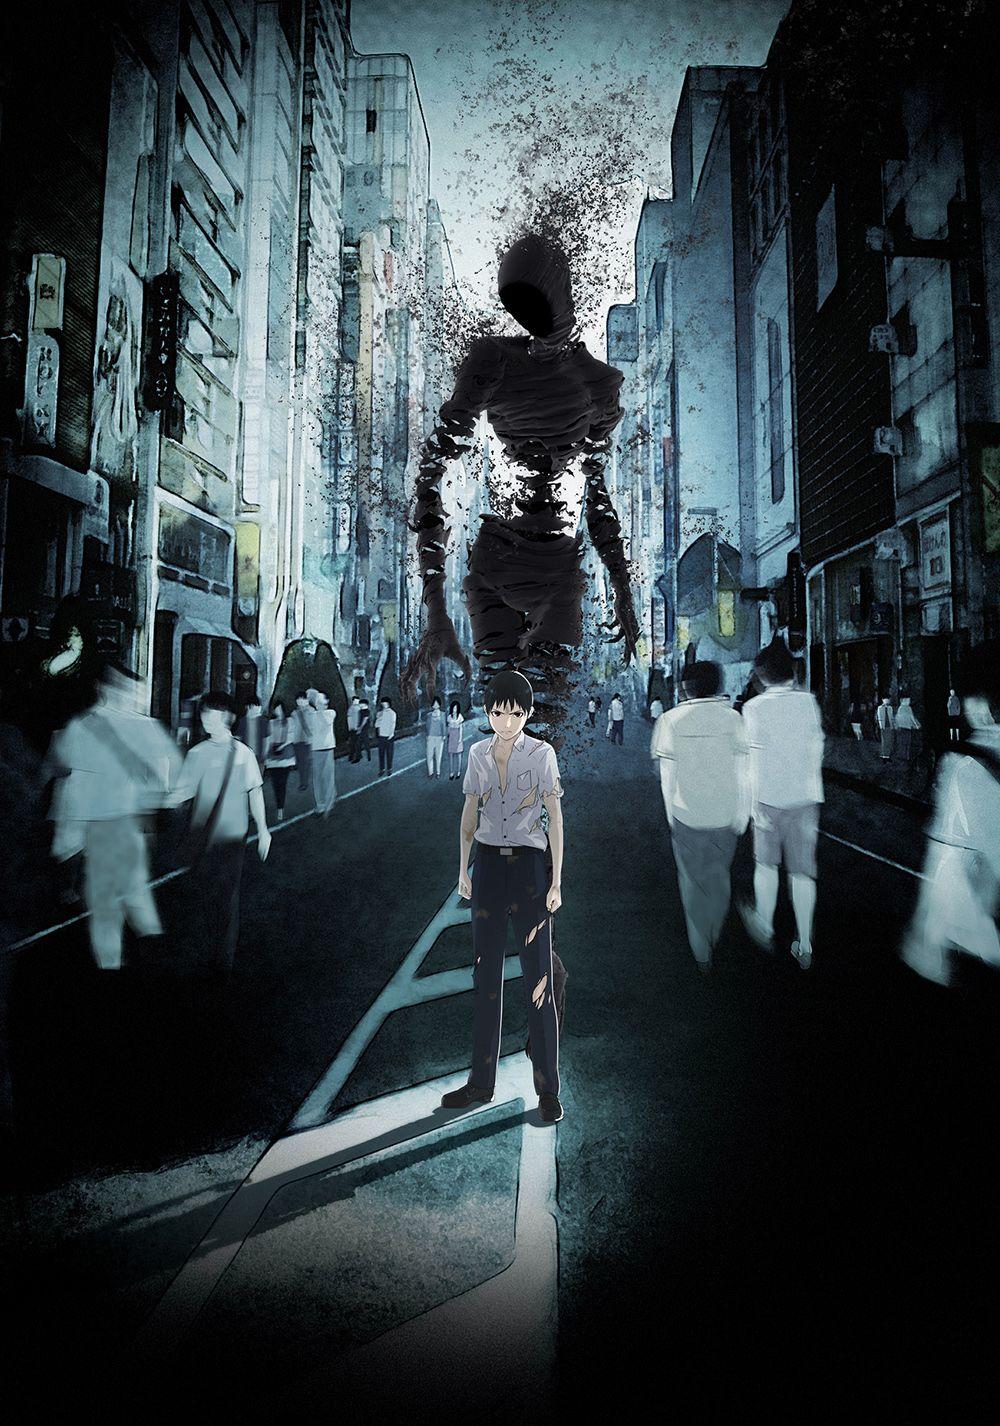 Ajin DemiHuman (With images) Ajin anime, Ajin, Anime films